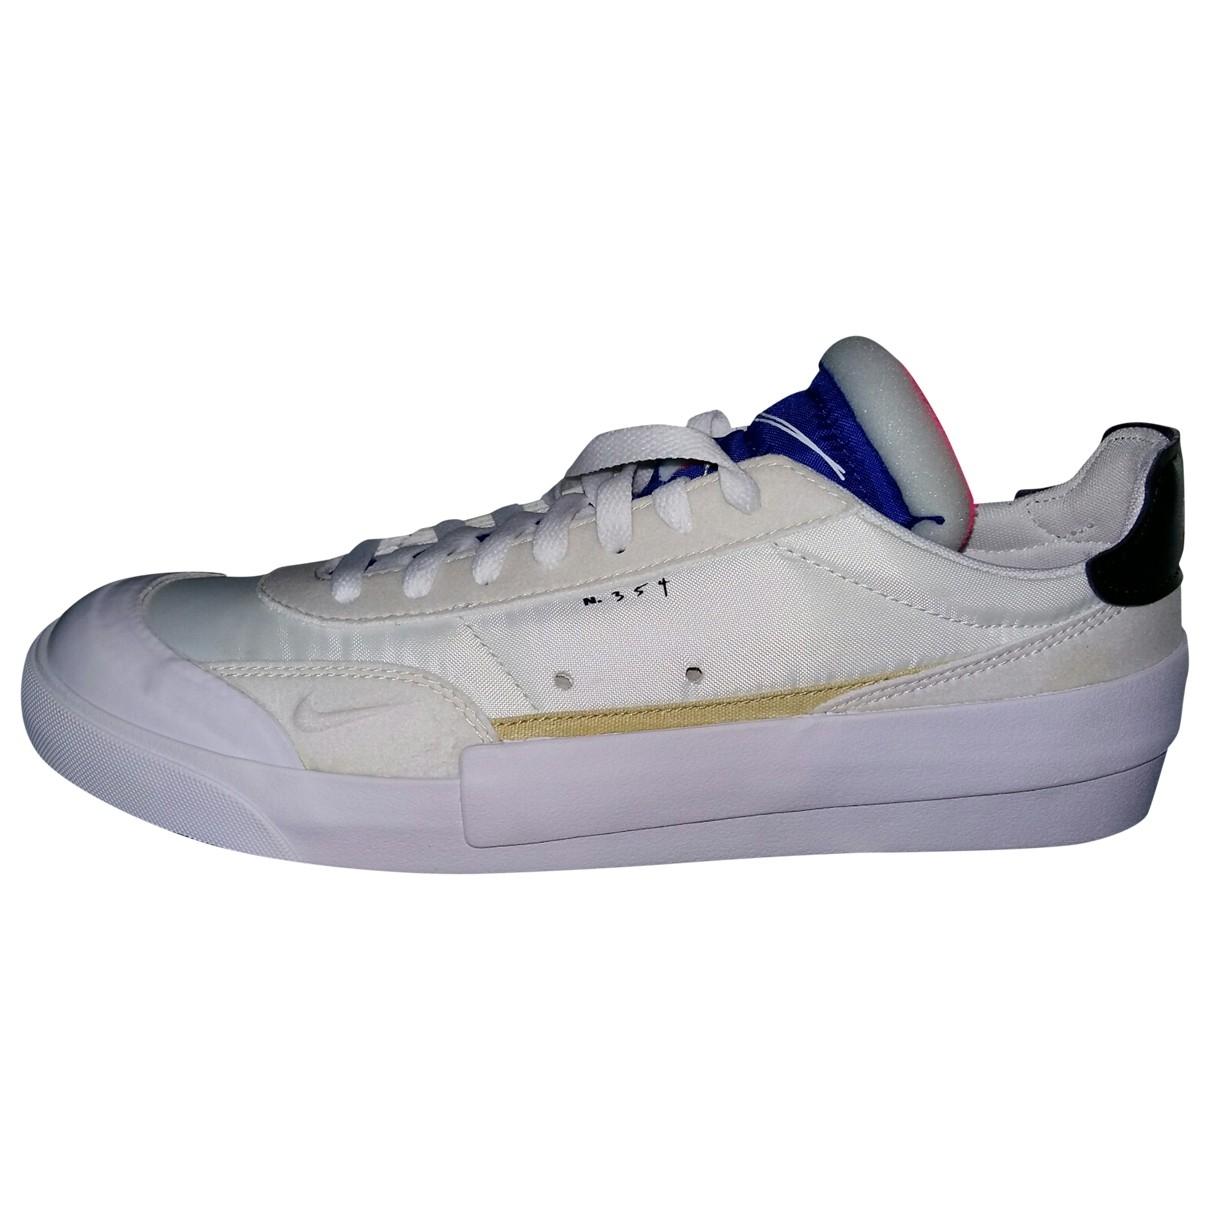 Nike - Baskets SB Dunk  pour homme en toile - blanc